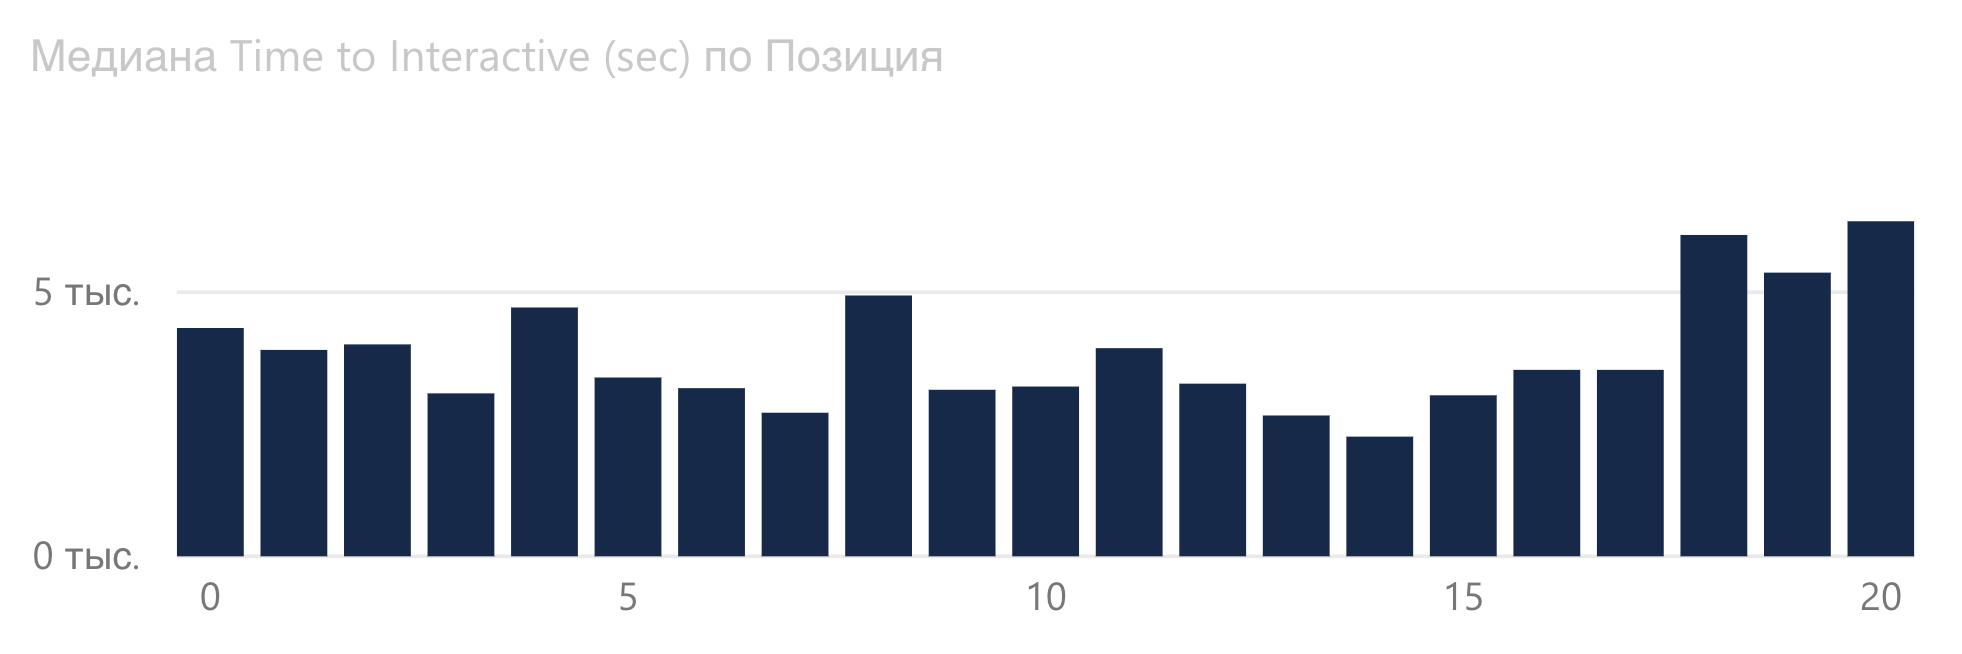 График зависимости Time to Interactive от позиции Google в букмекерской сфере.